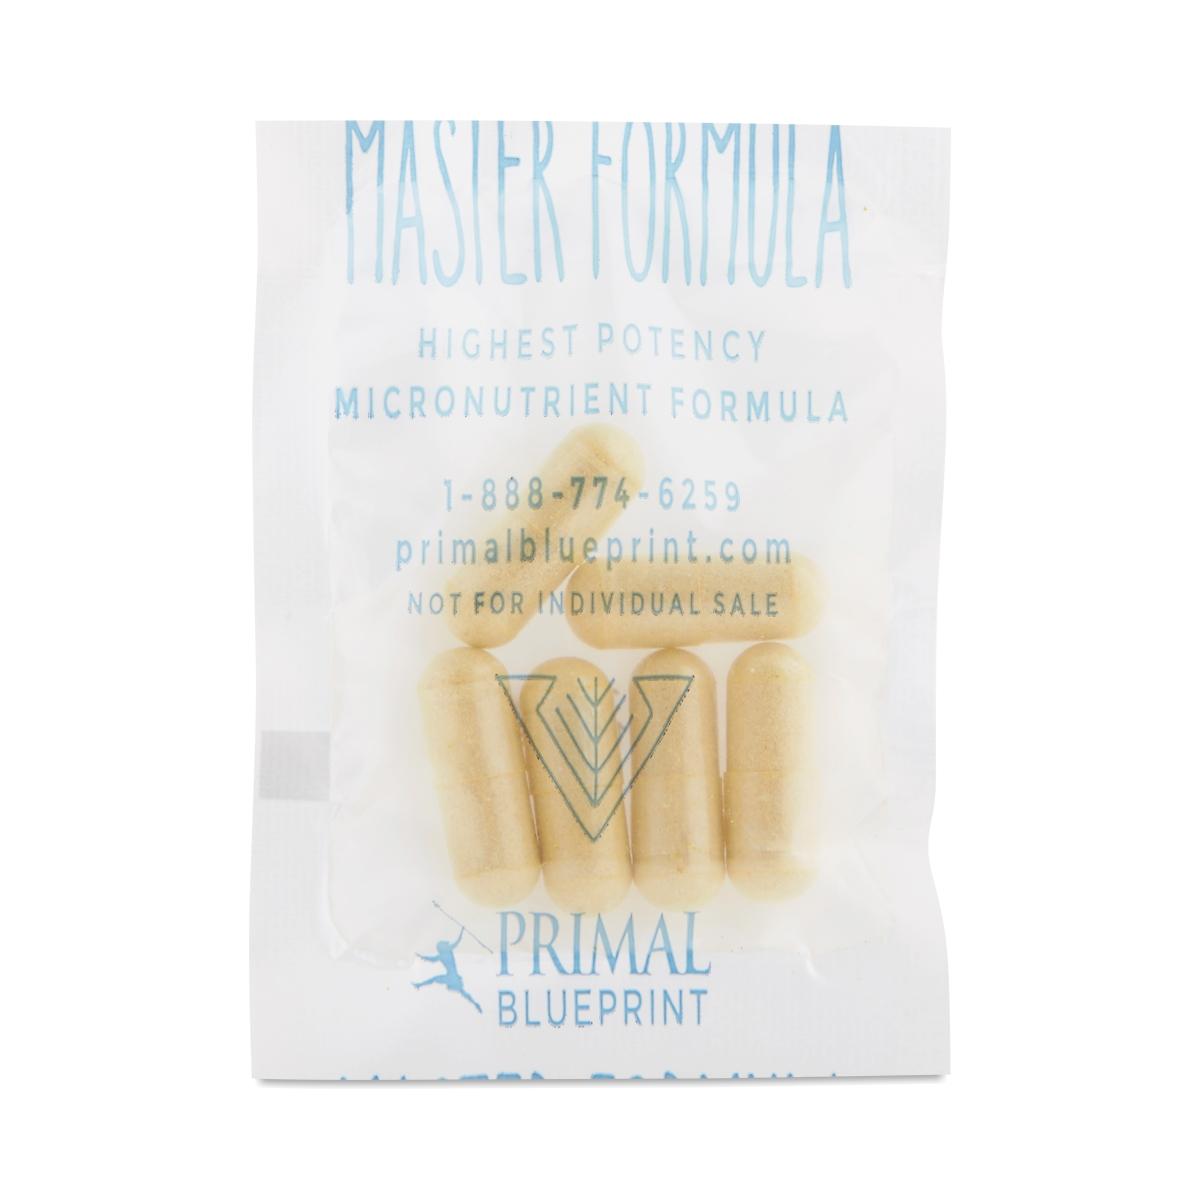 Primal master formula by primal blueprint thrive market malvernweather Choice Image